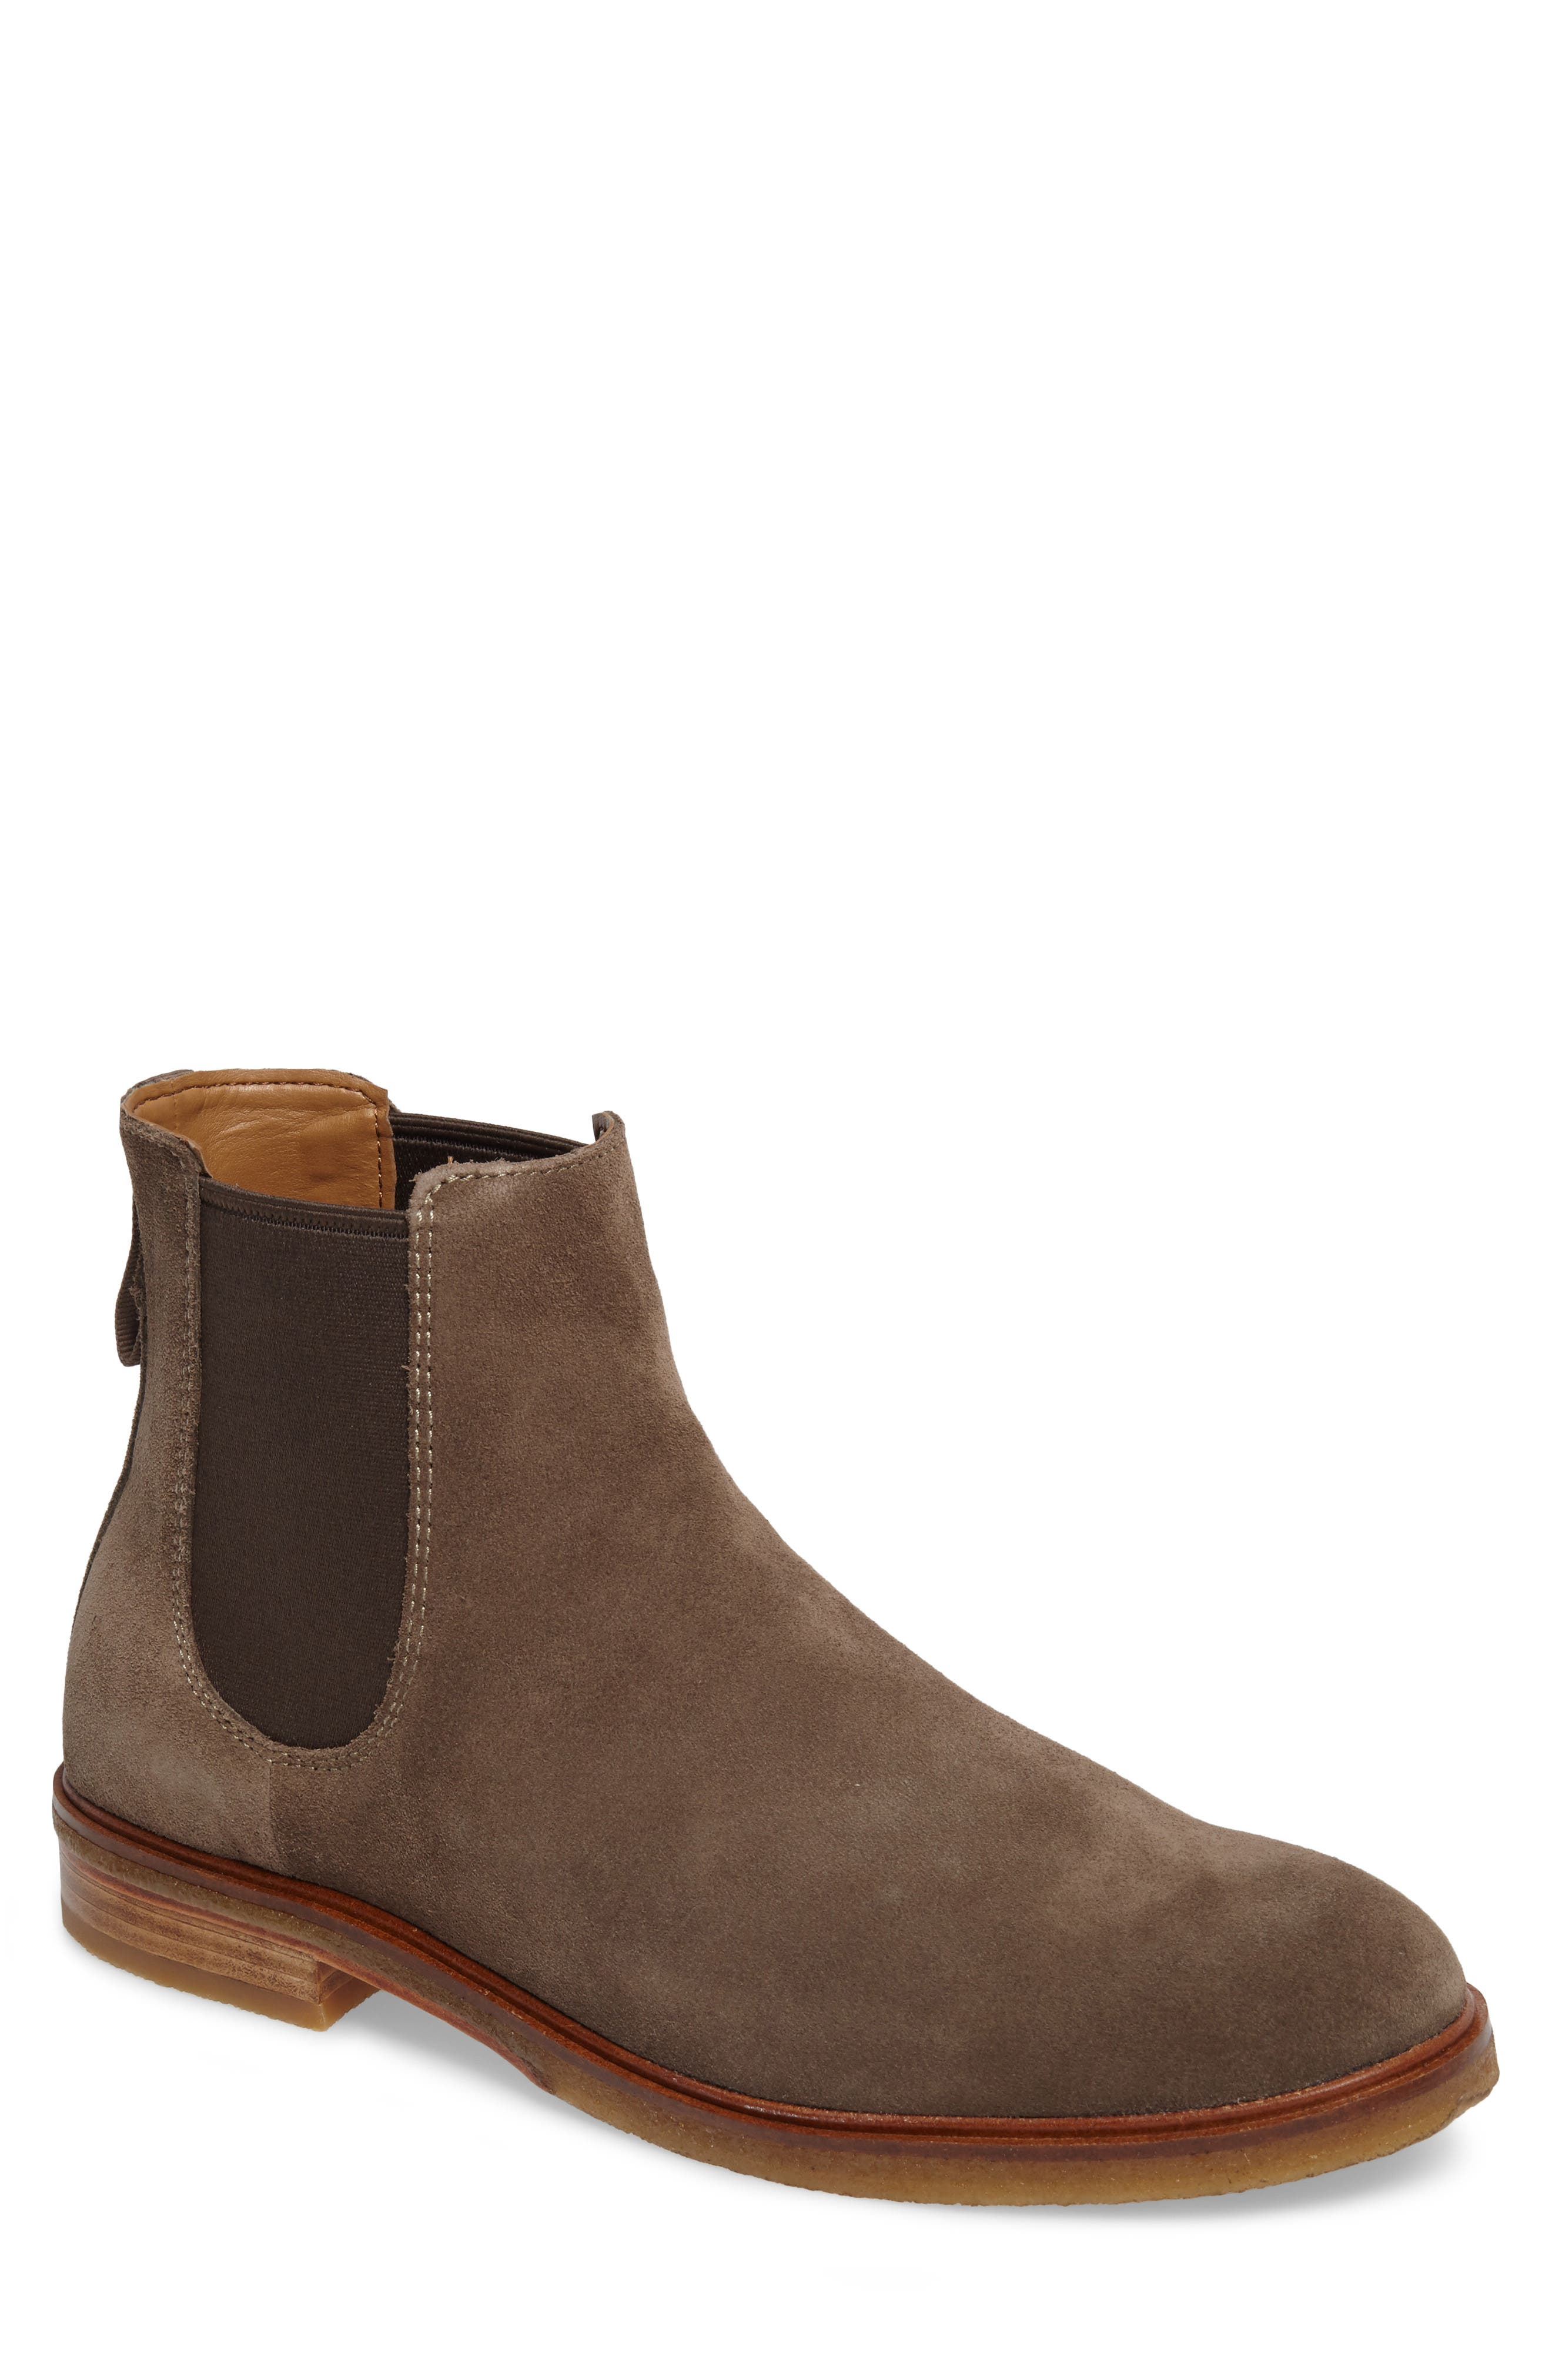 Main Image - Clarks® Clarkdale Chelsea Boot (Men)